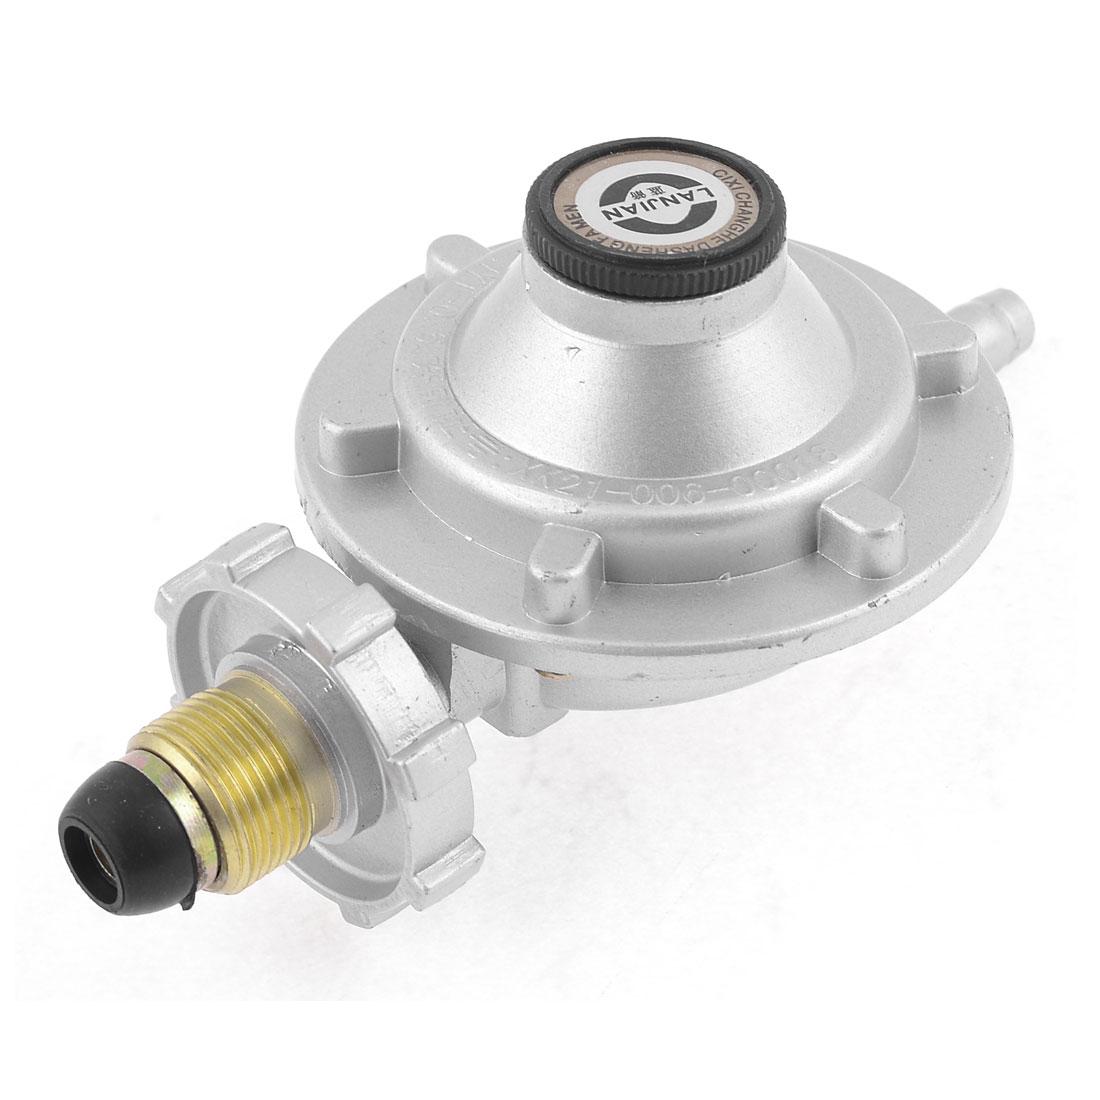 "Home 1/2""PT Male Thread Gas Liquefied Petroleum Pressure Regulator Silver Tone"